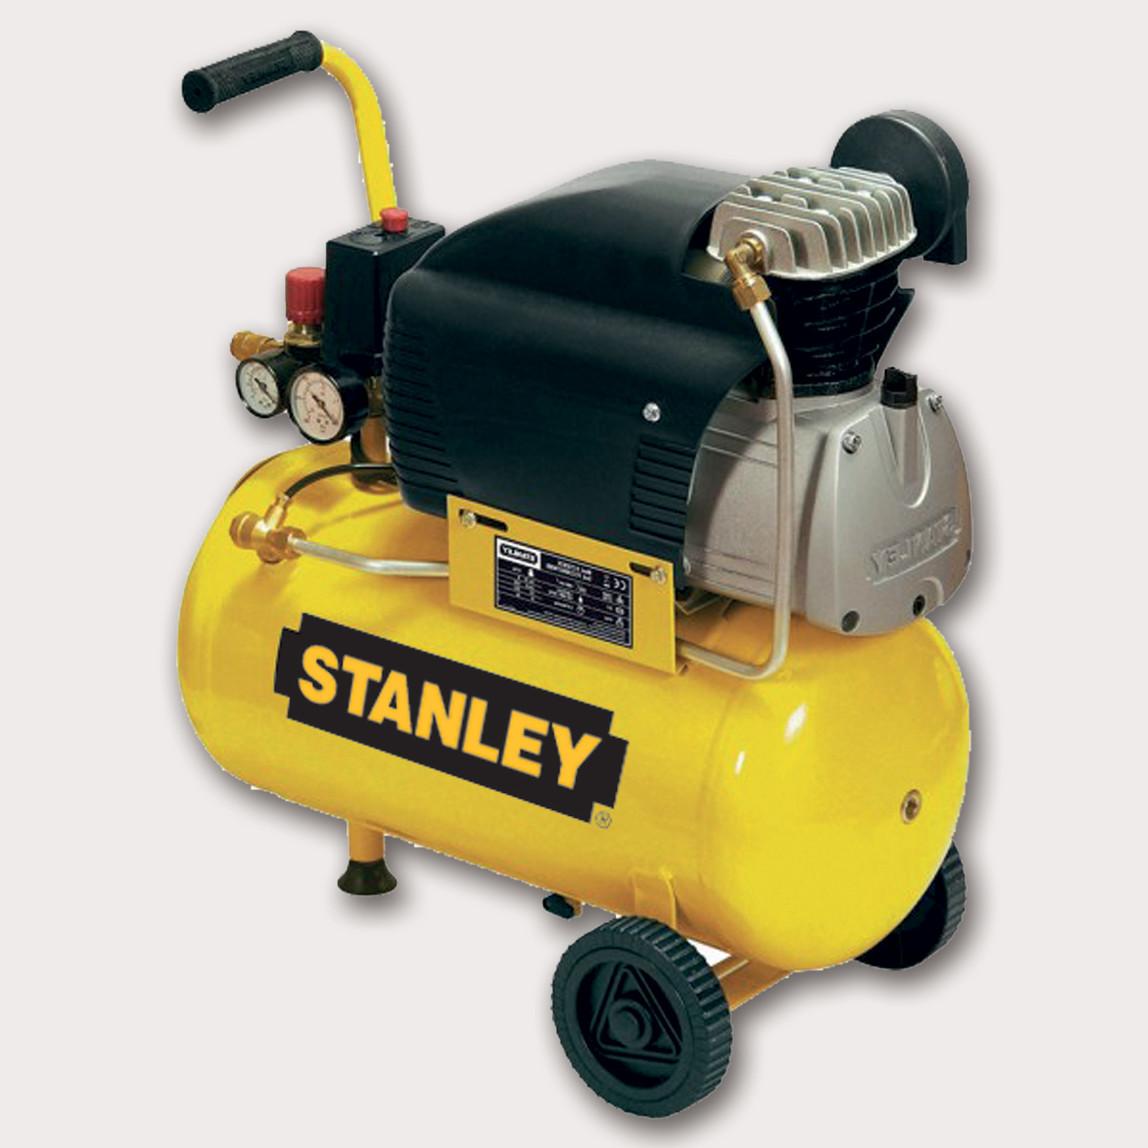 Stanley FCCC404STN005 24 Lt 8 Bar 2Hp Hava Kompresörü